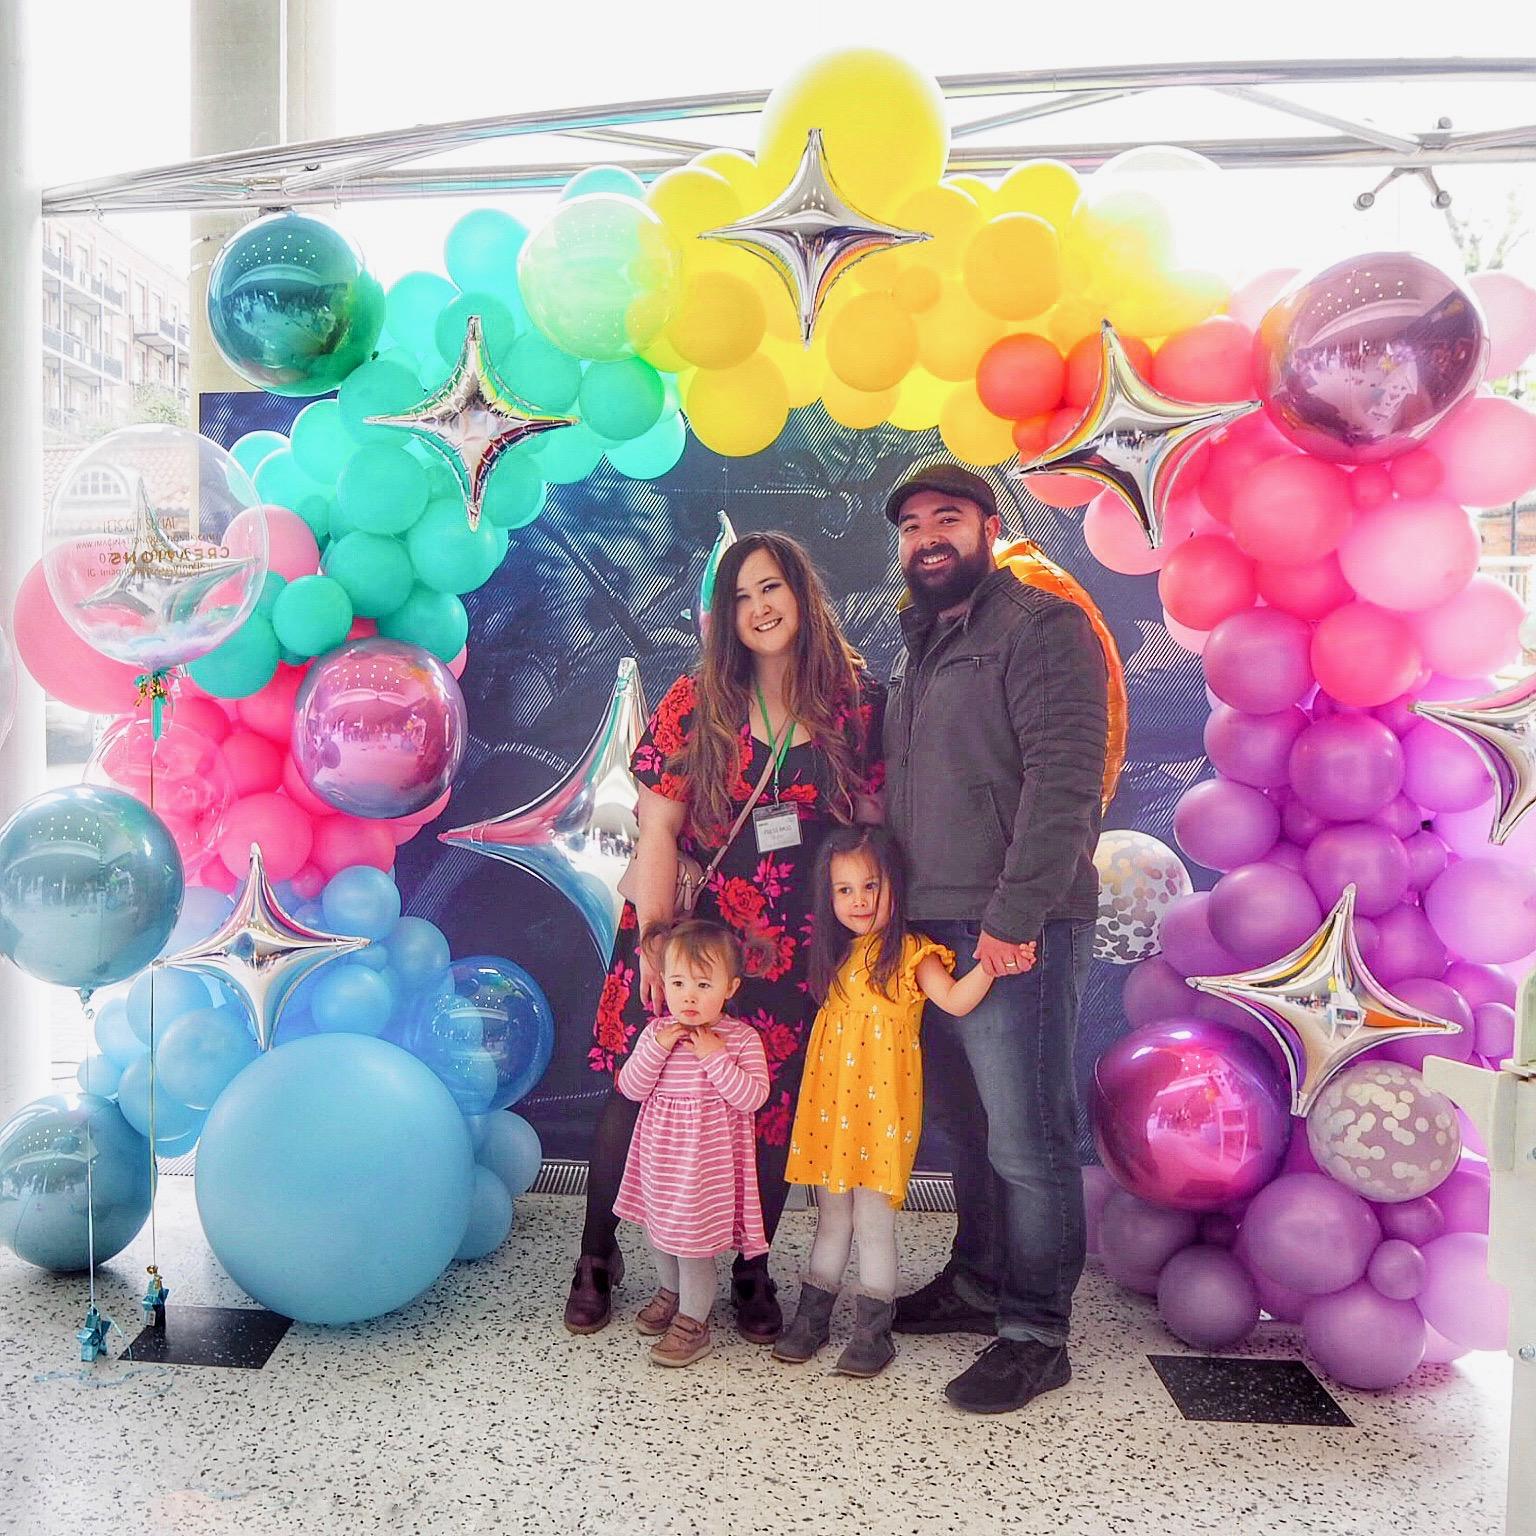 bump baby expo york balloons imagination creations uk